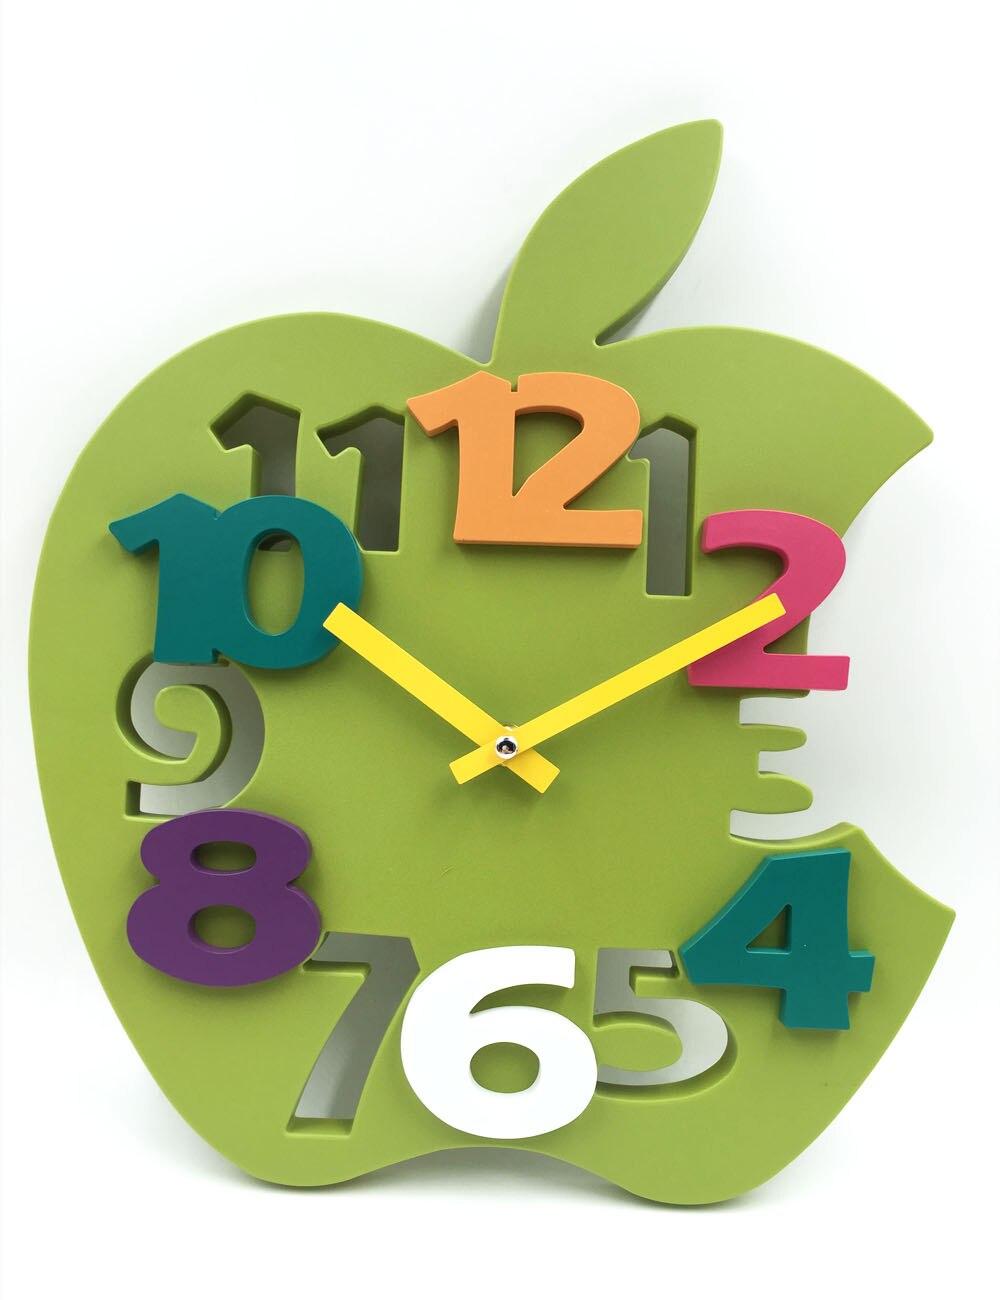 Brand Hippih Mute 3d Apple Shaped Wall Clock 3429cm Hot Sale Reloj